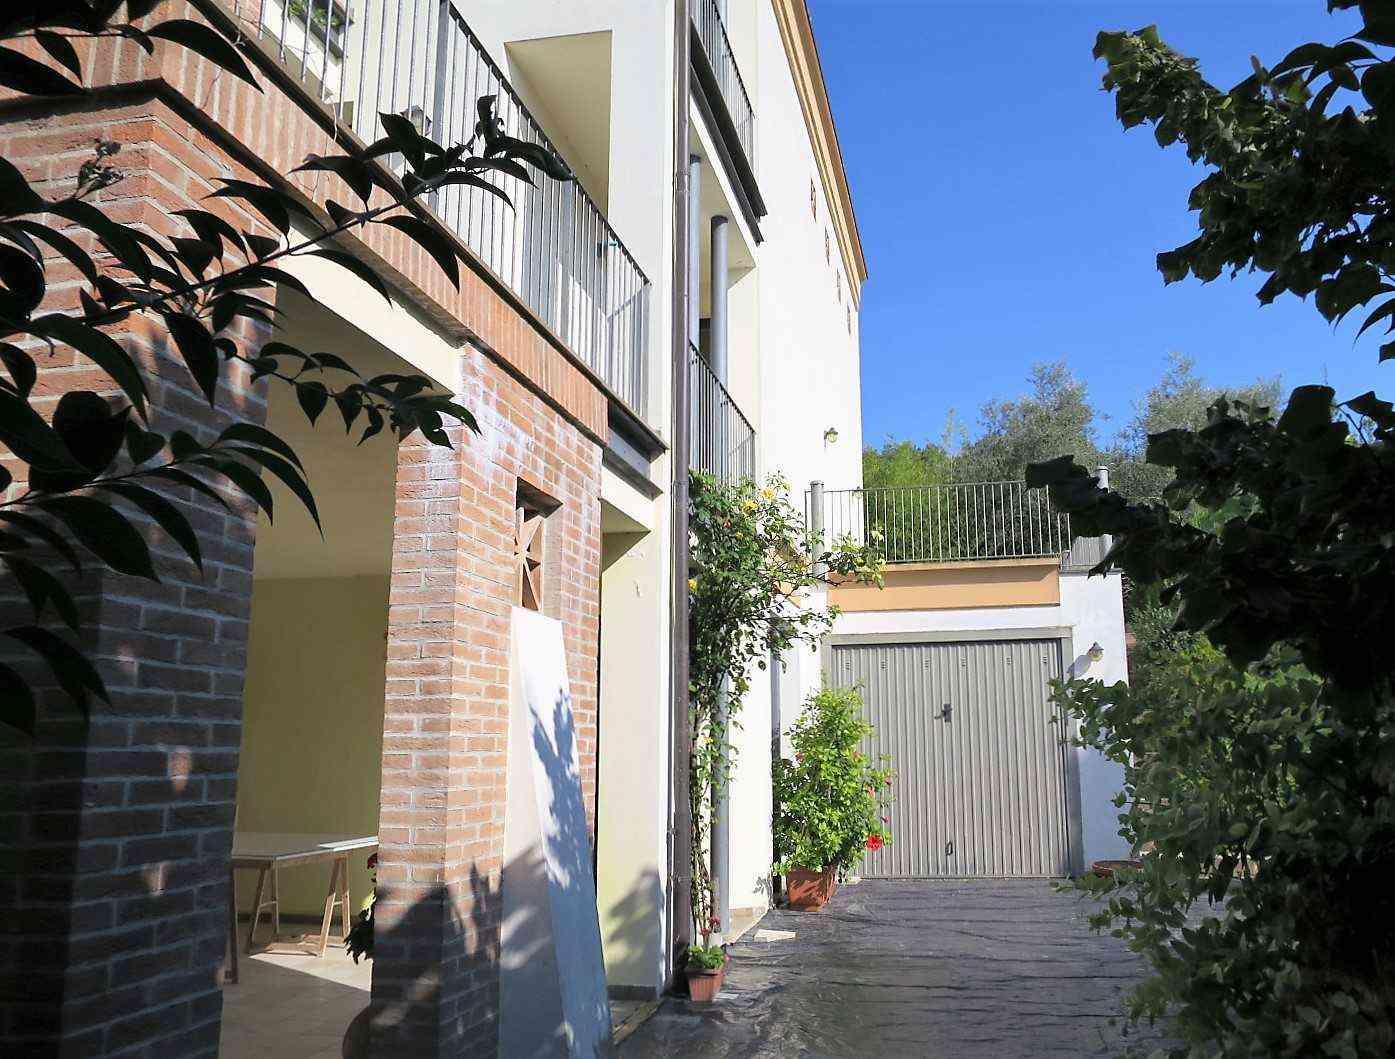 Villa Villa in vendita Atri (TE), Villa Paola - Atri - EUR 473.281 160